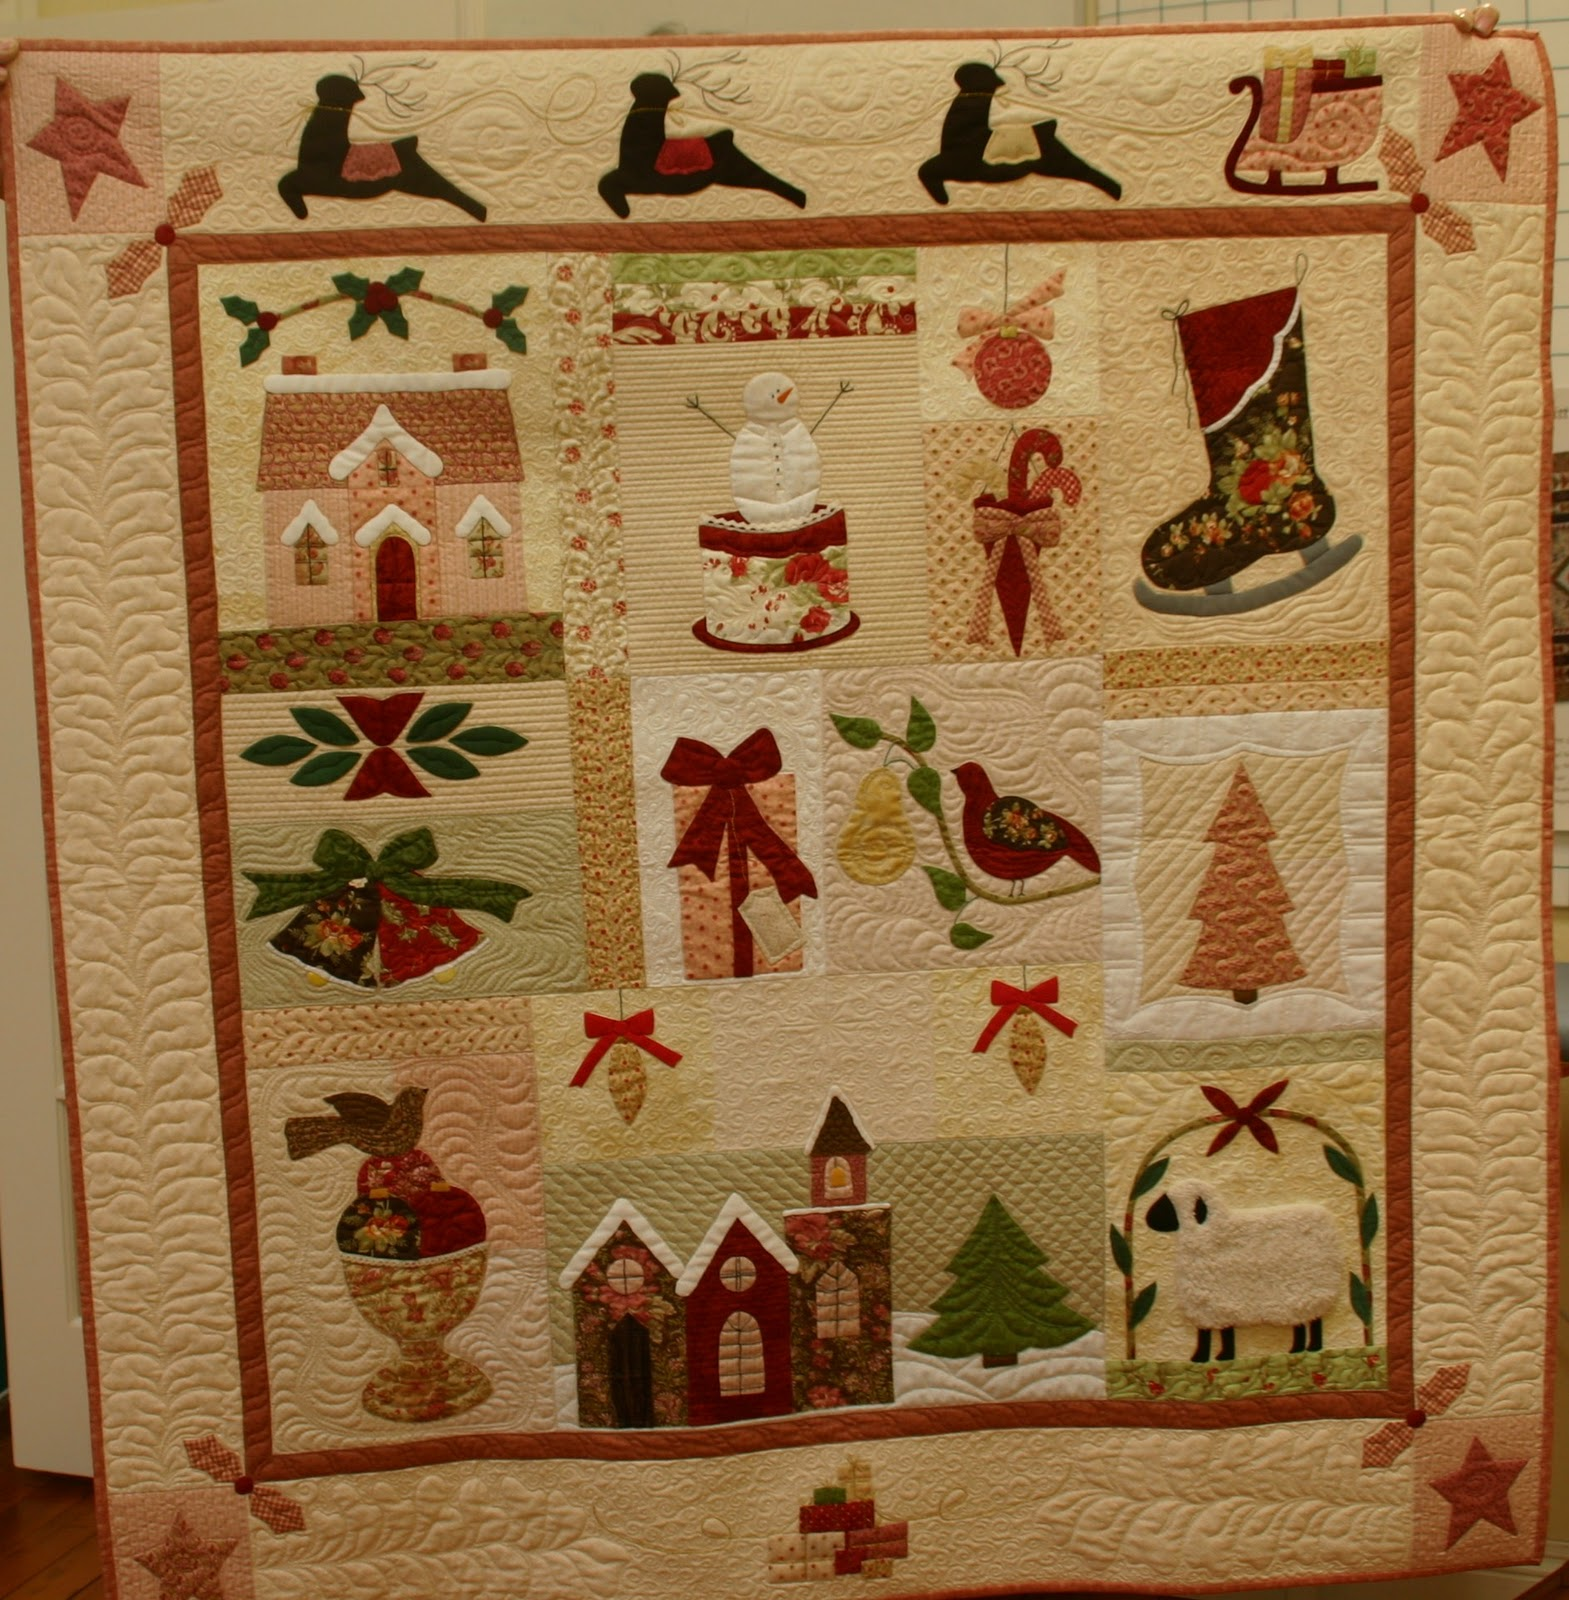 Sew'n Wild Oaks Quilting Blog: A Vintage Christmas : vintage christmas quilt - Adamdwight.com